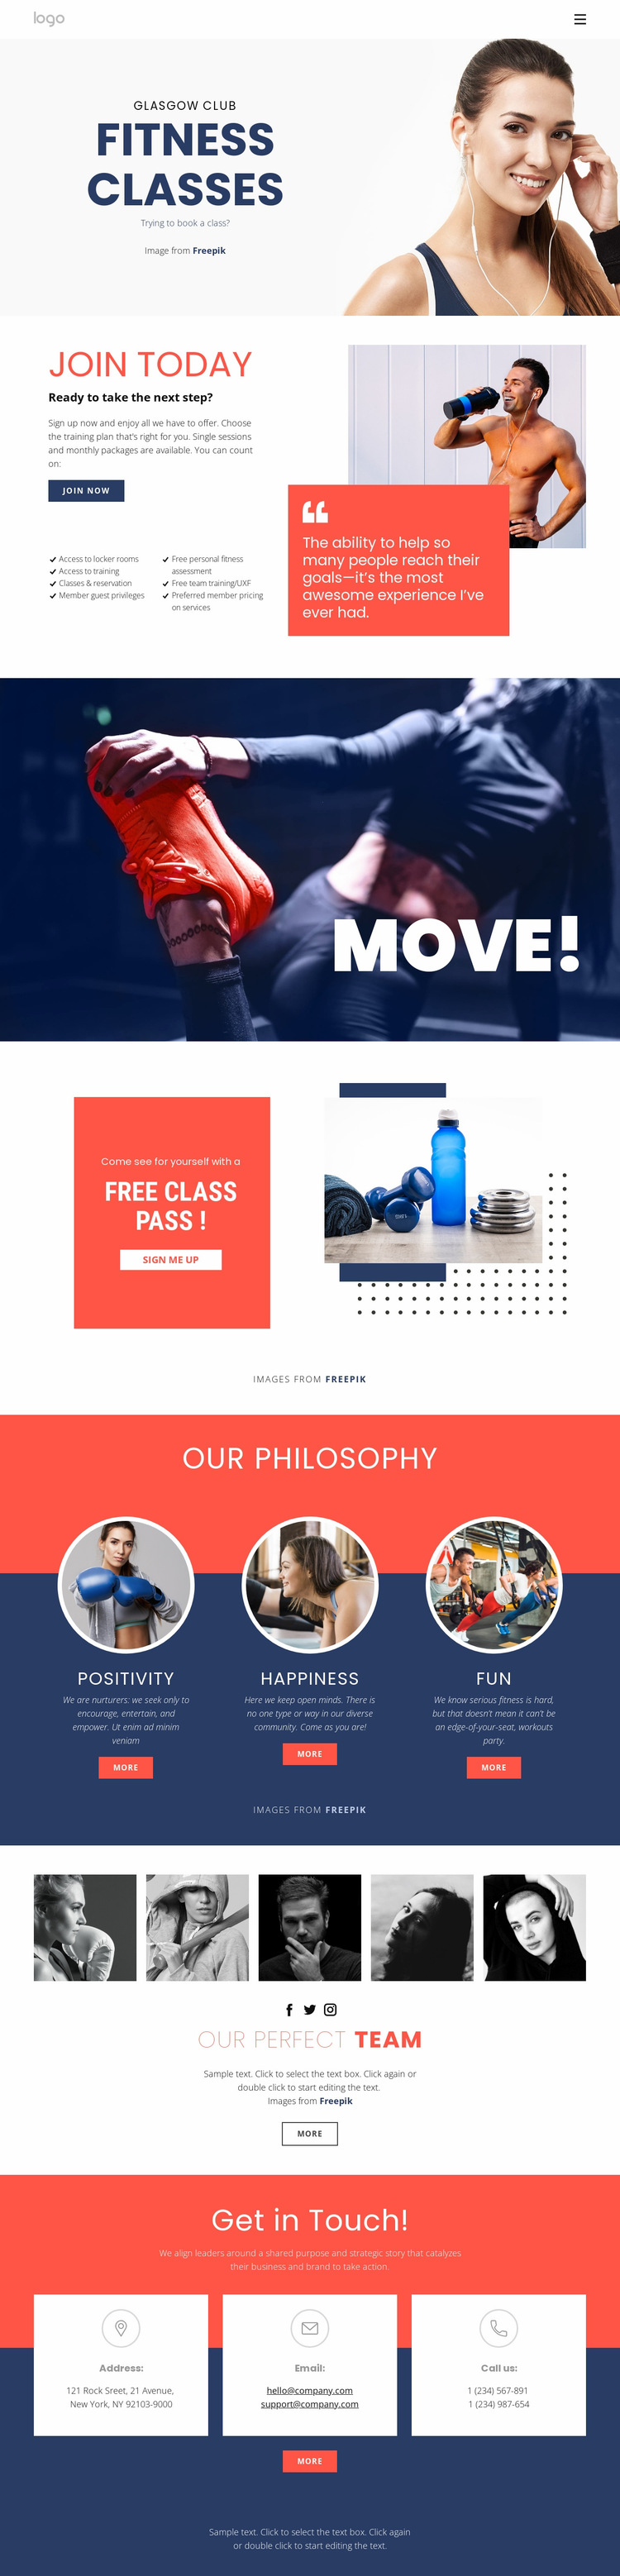 Group Fitness Classes Website Builder